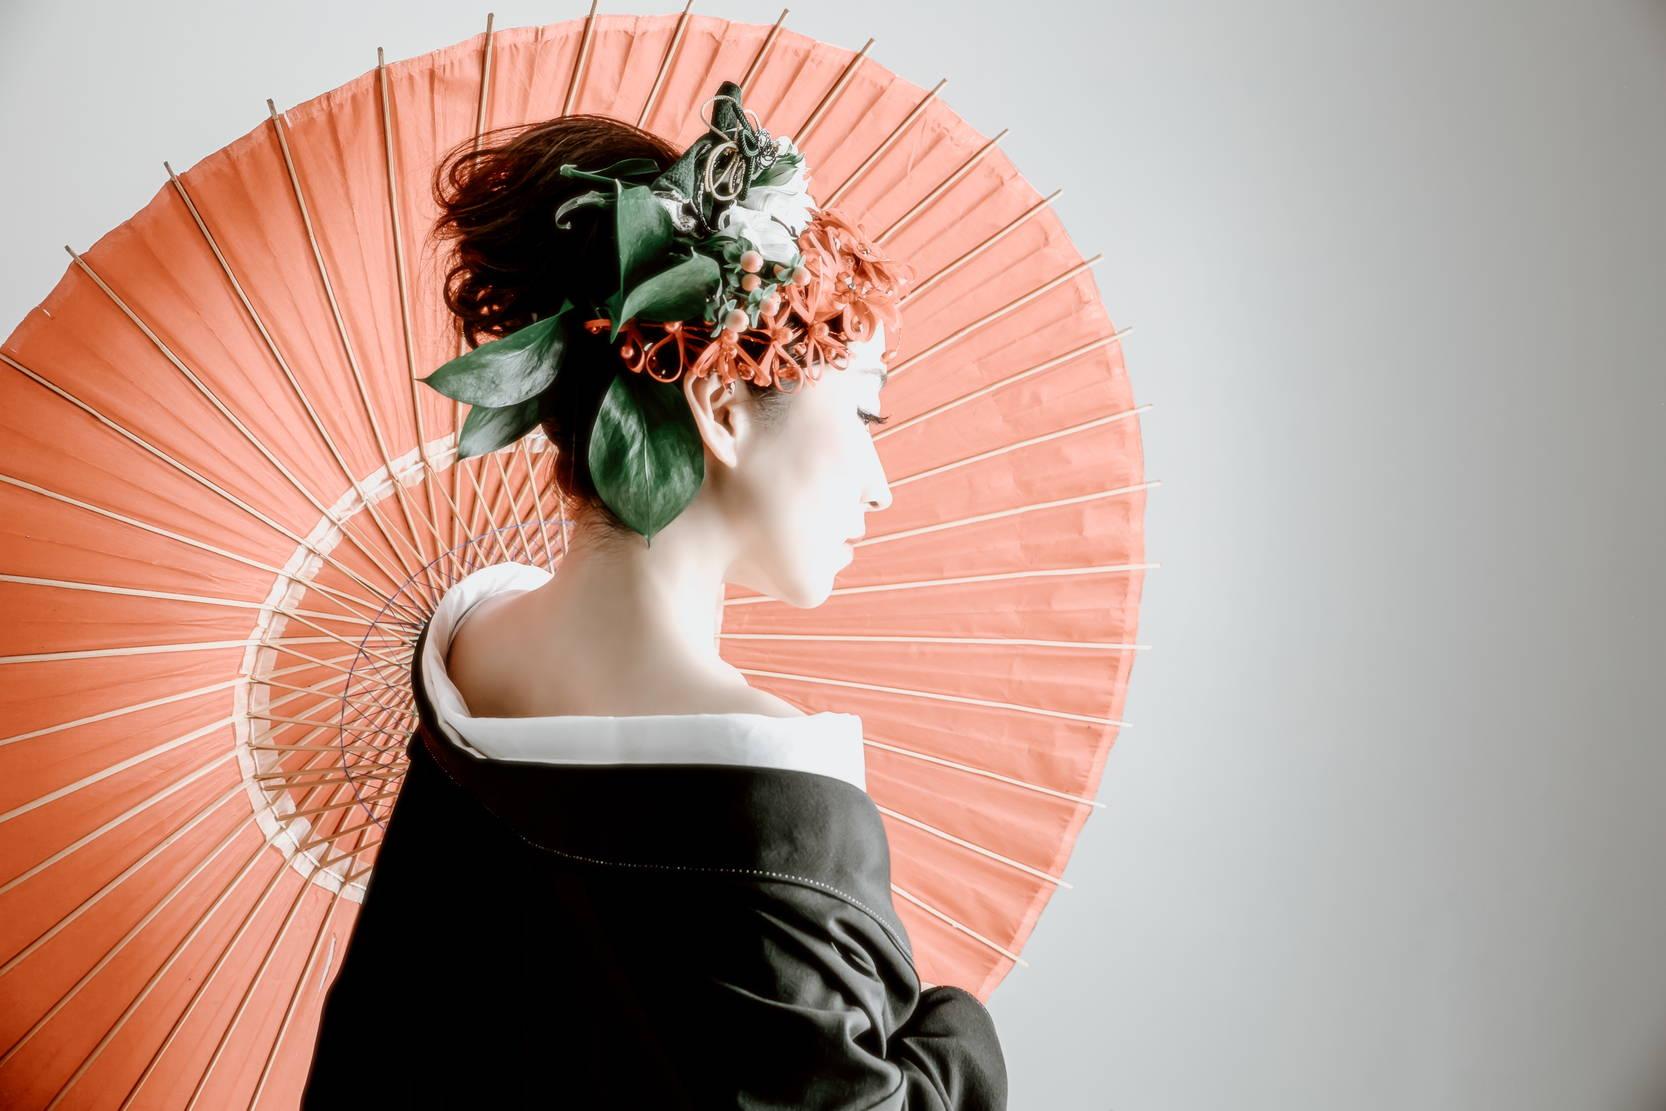 Tozaime - Geisha with classical umbrella and make-up